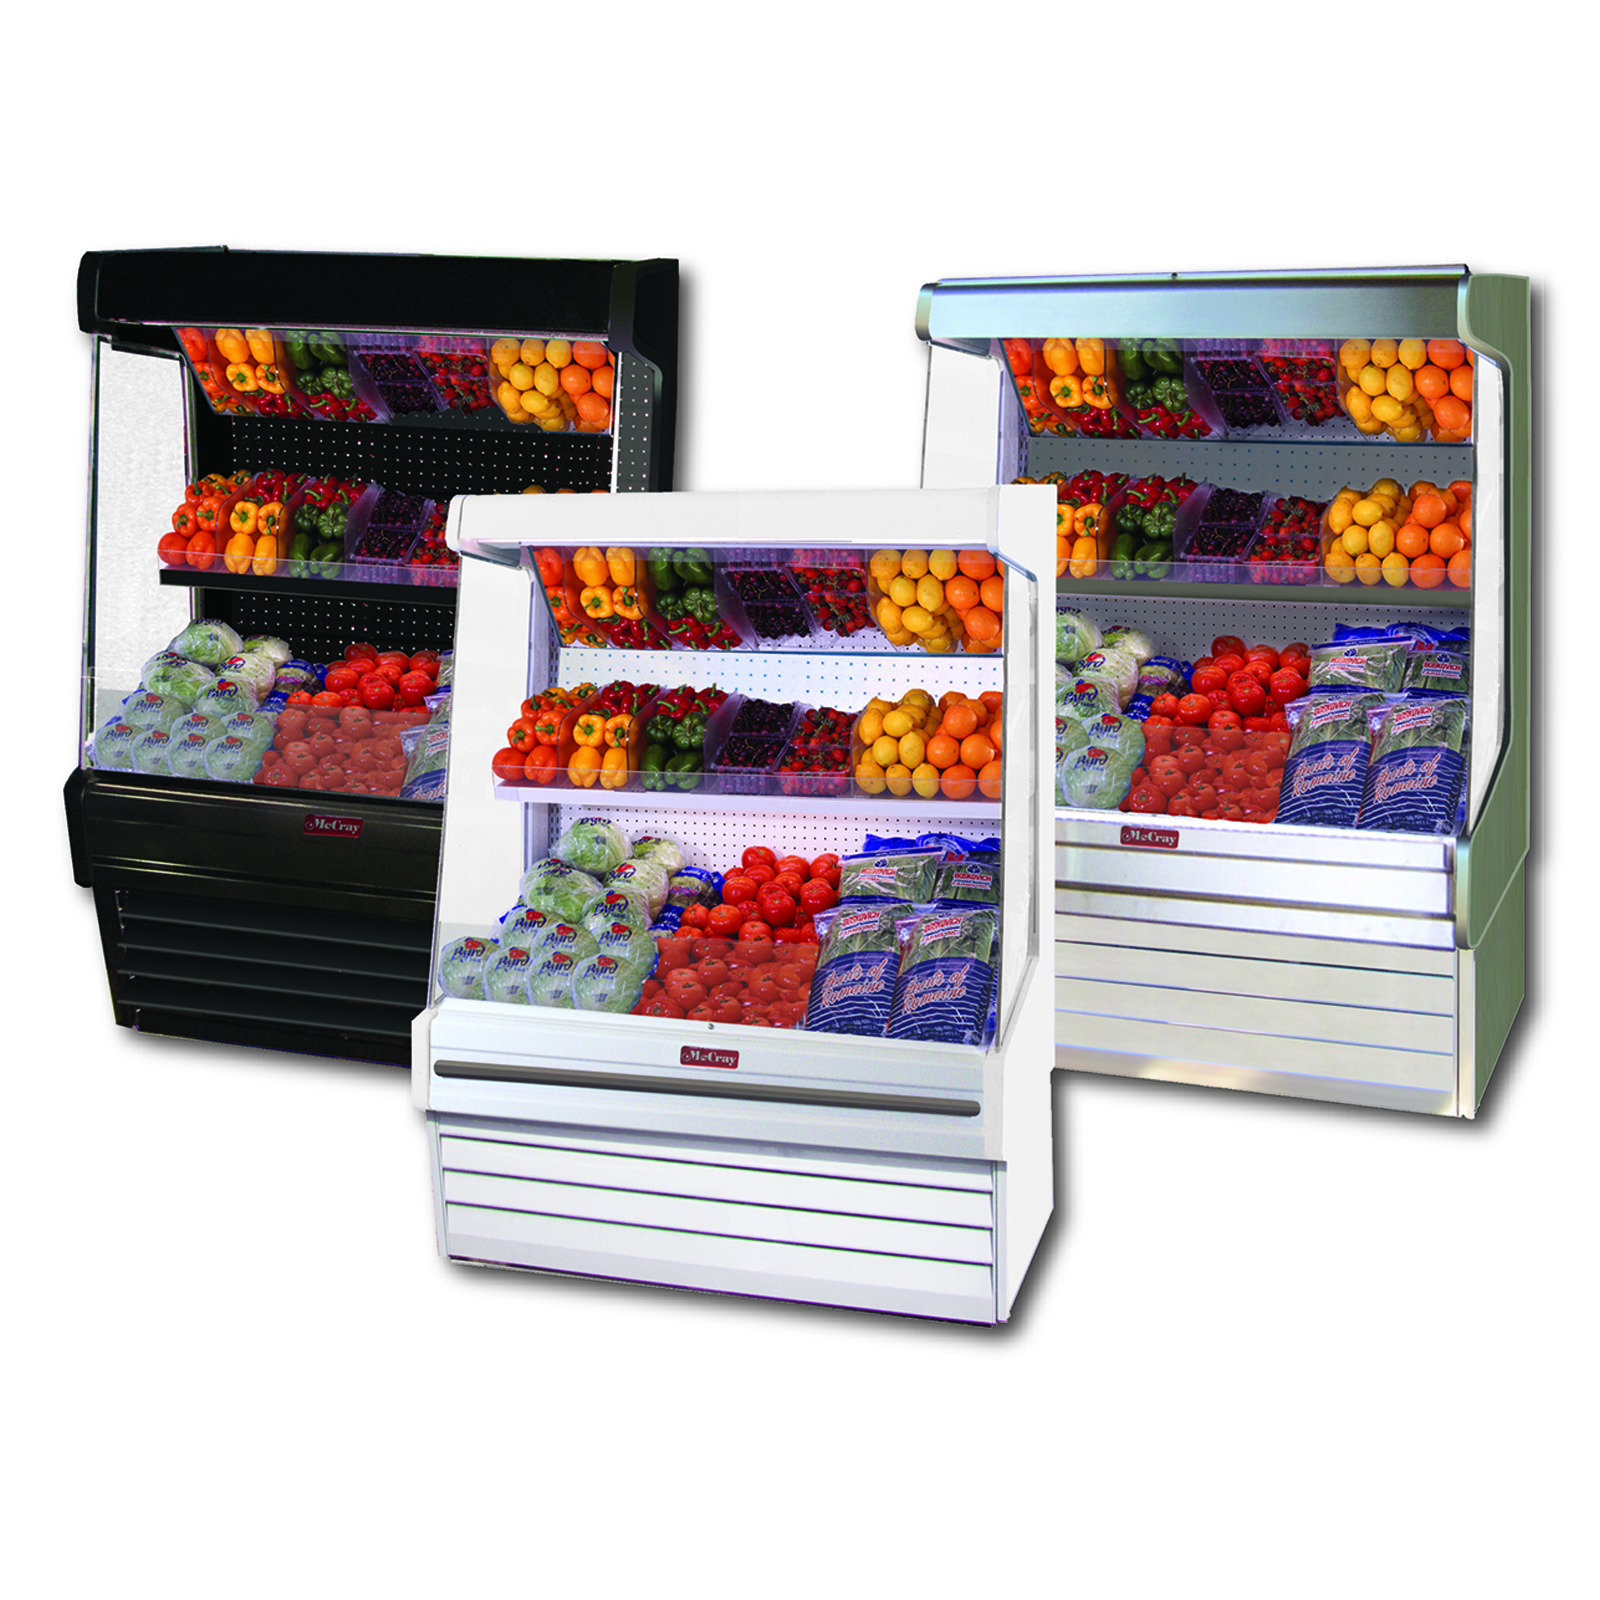 Howard-McCray R-OP30E-3-B-LED display case, produce